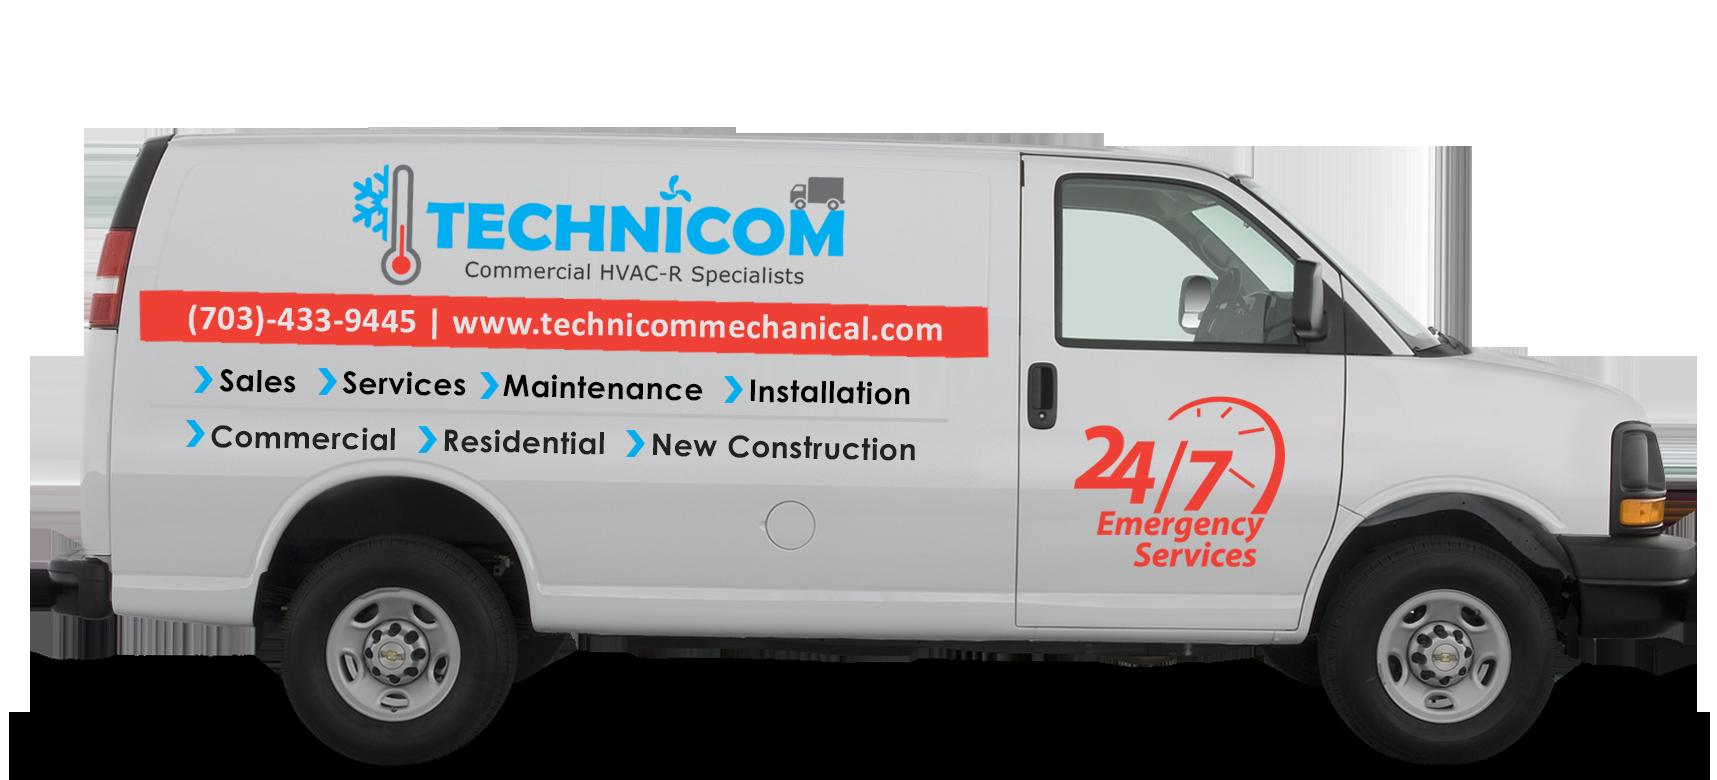 Technicom HVAC Service Van